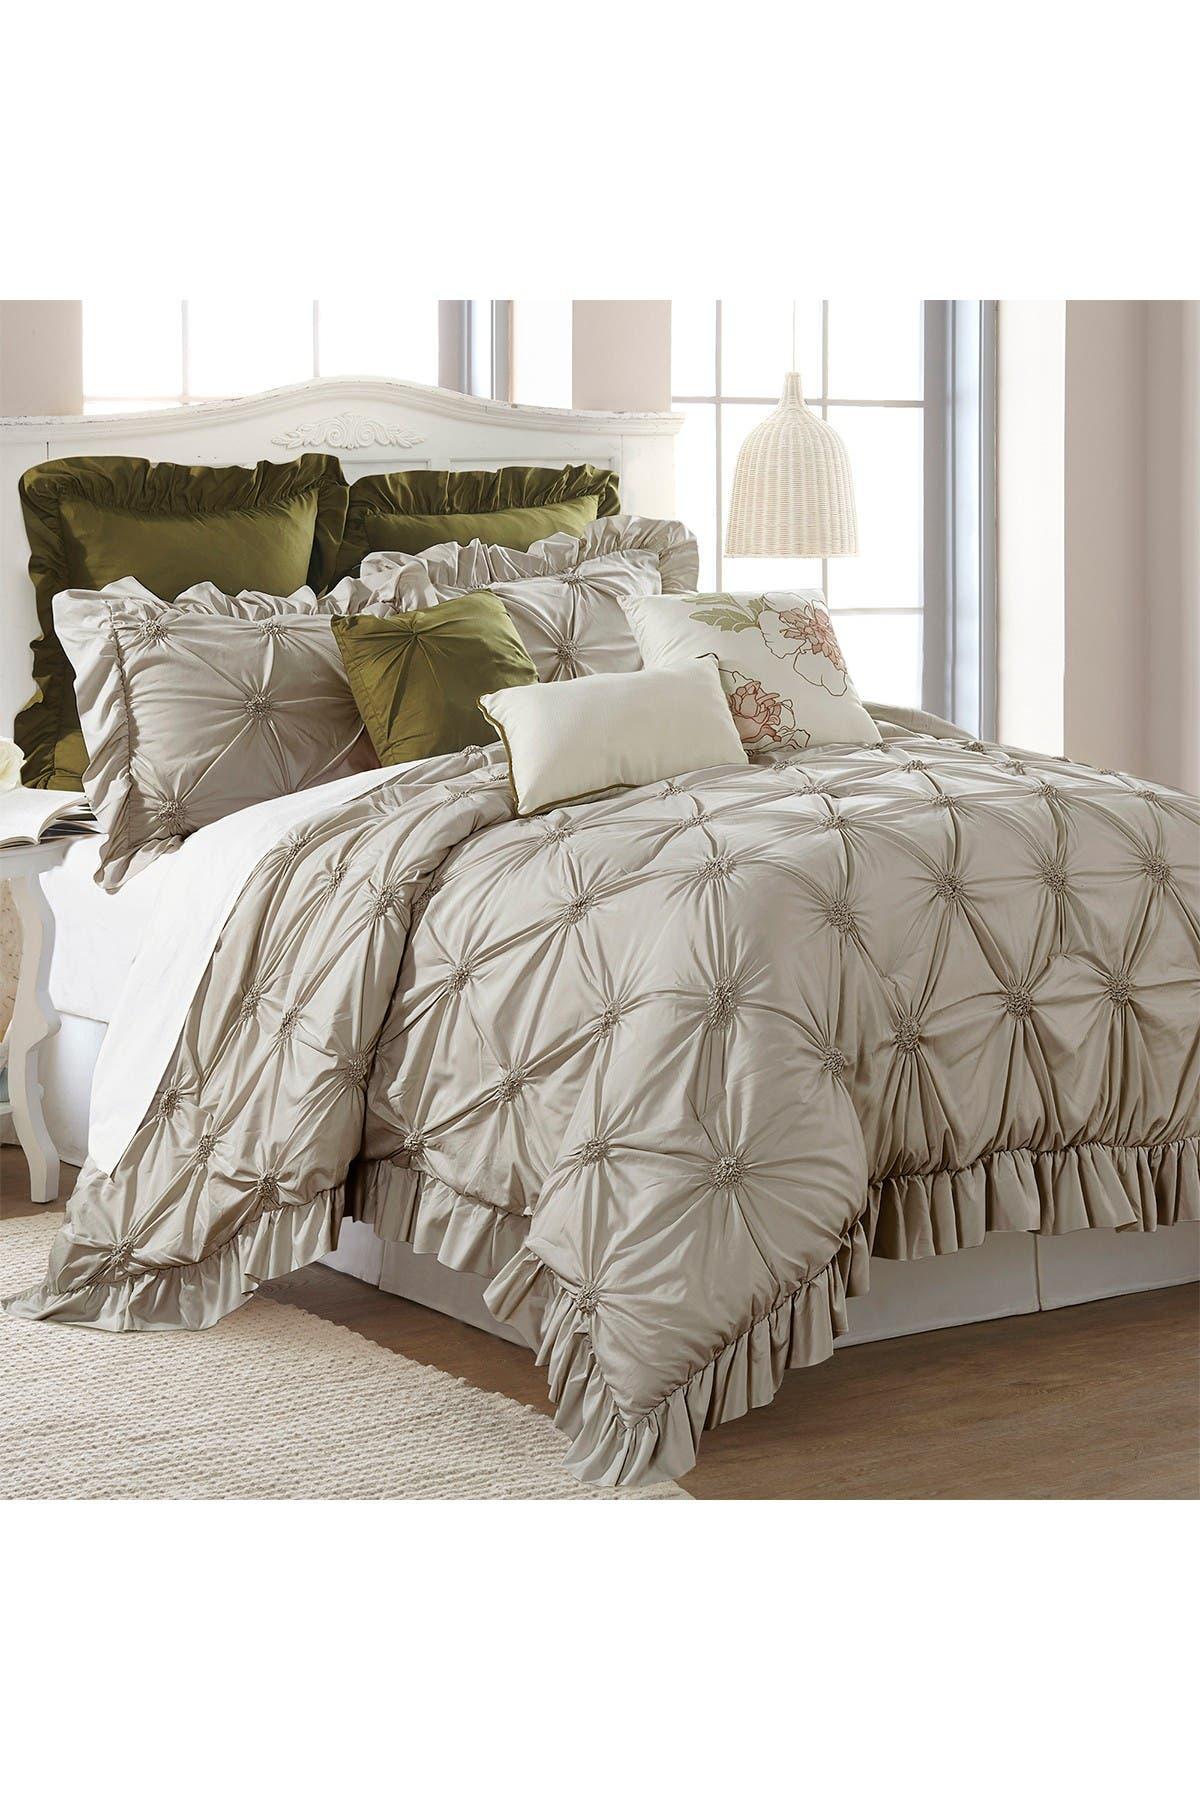 Image of Modern Threads Queen Caroline Comforter Set - Taupe